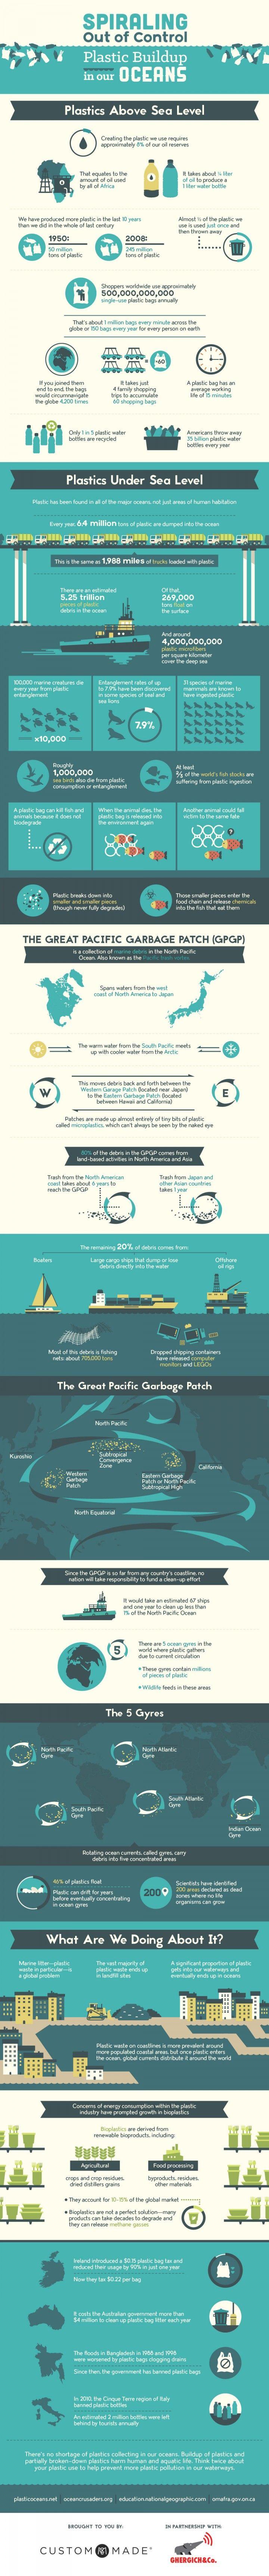 Plastic buildup in our oceans. (More design inspiration at www.aldenchong.com)